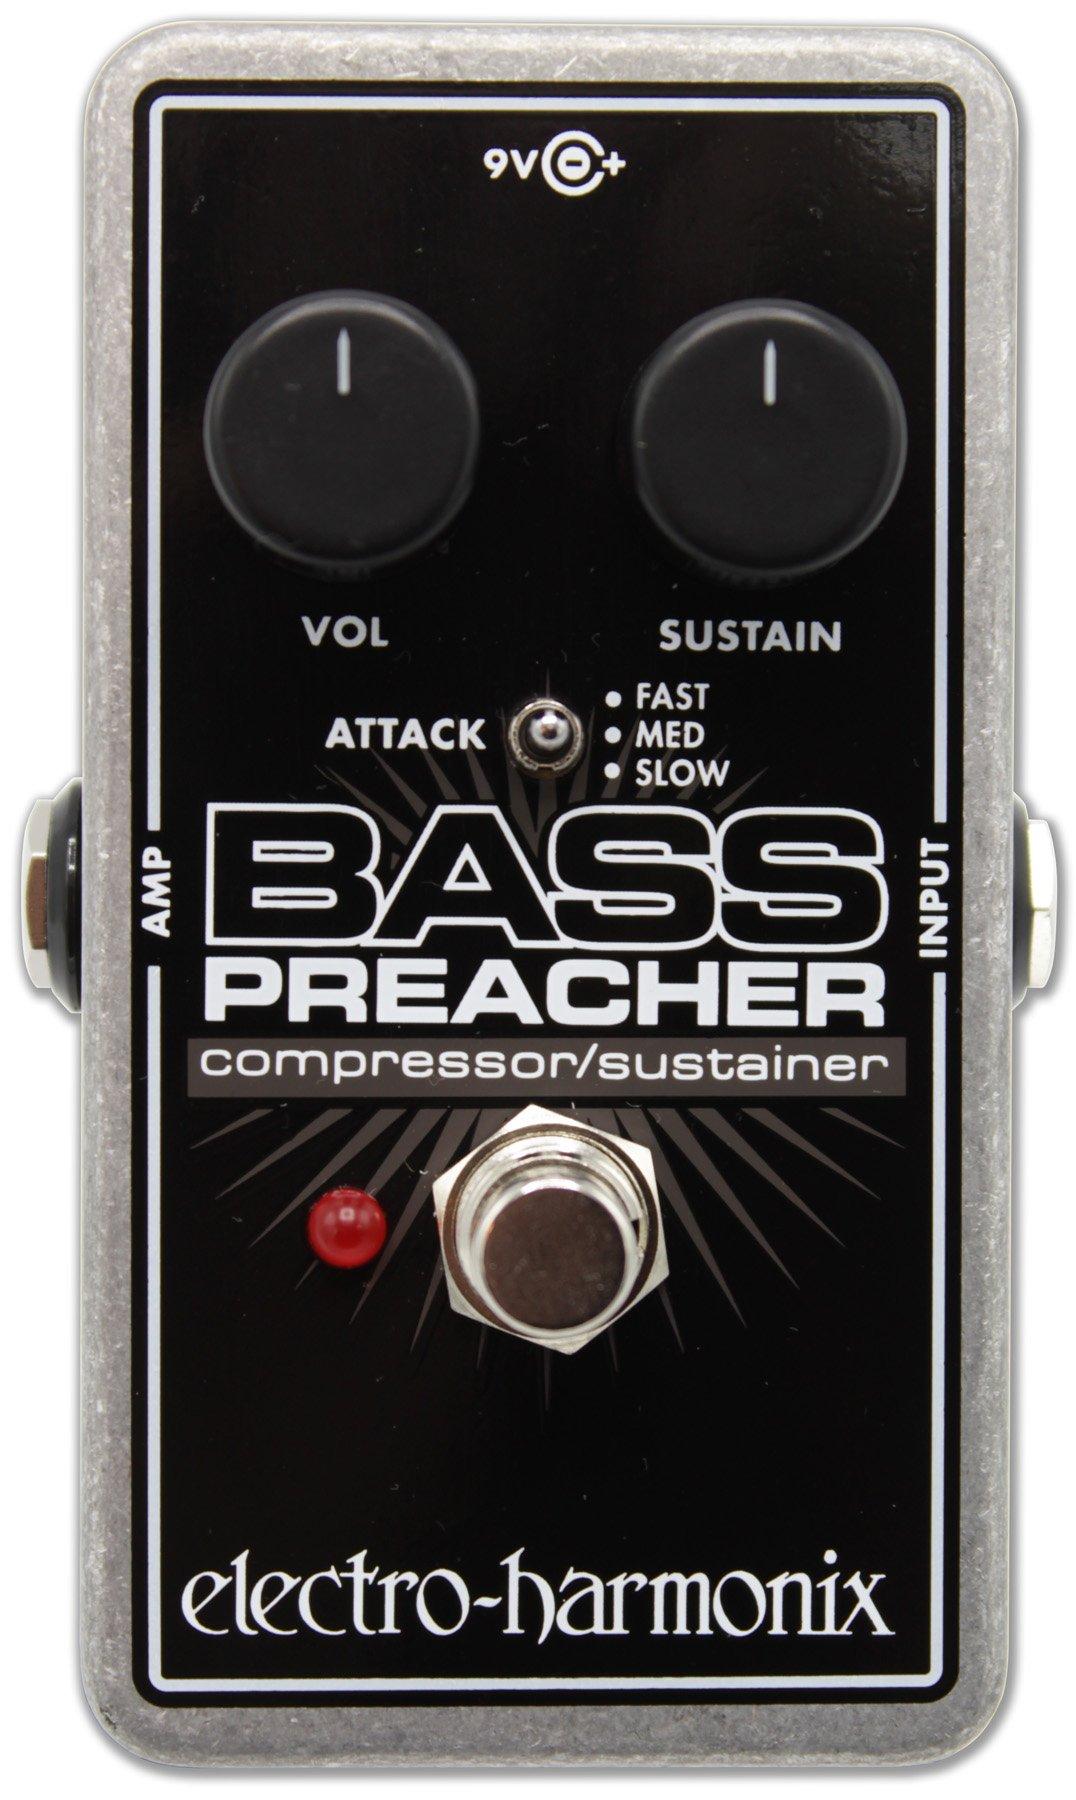 Electro Harmonix Bass Preacher Bass Compressor/Sustainer Pedal